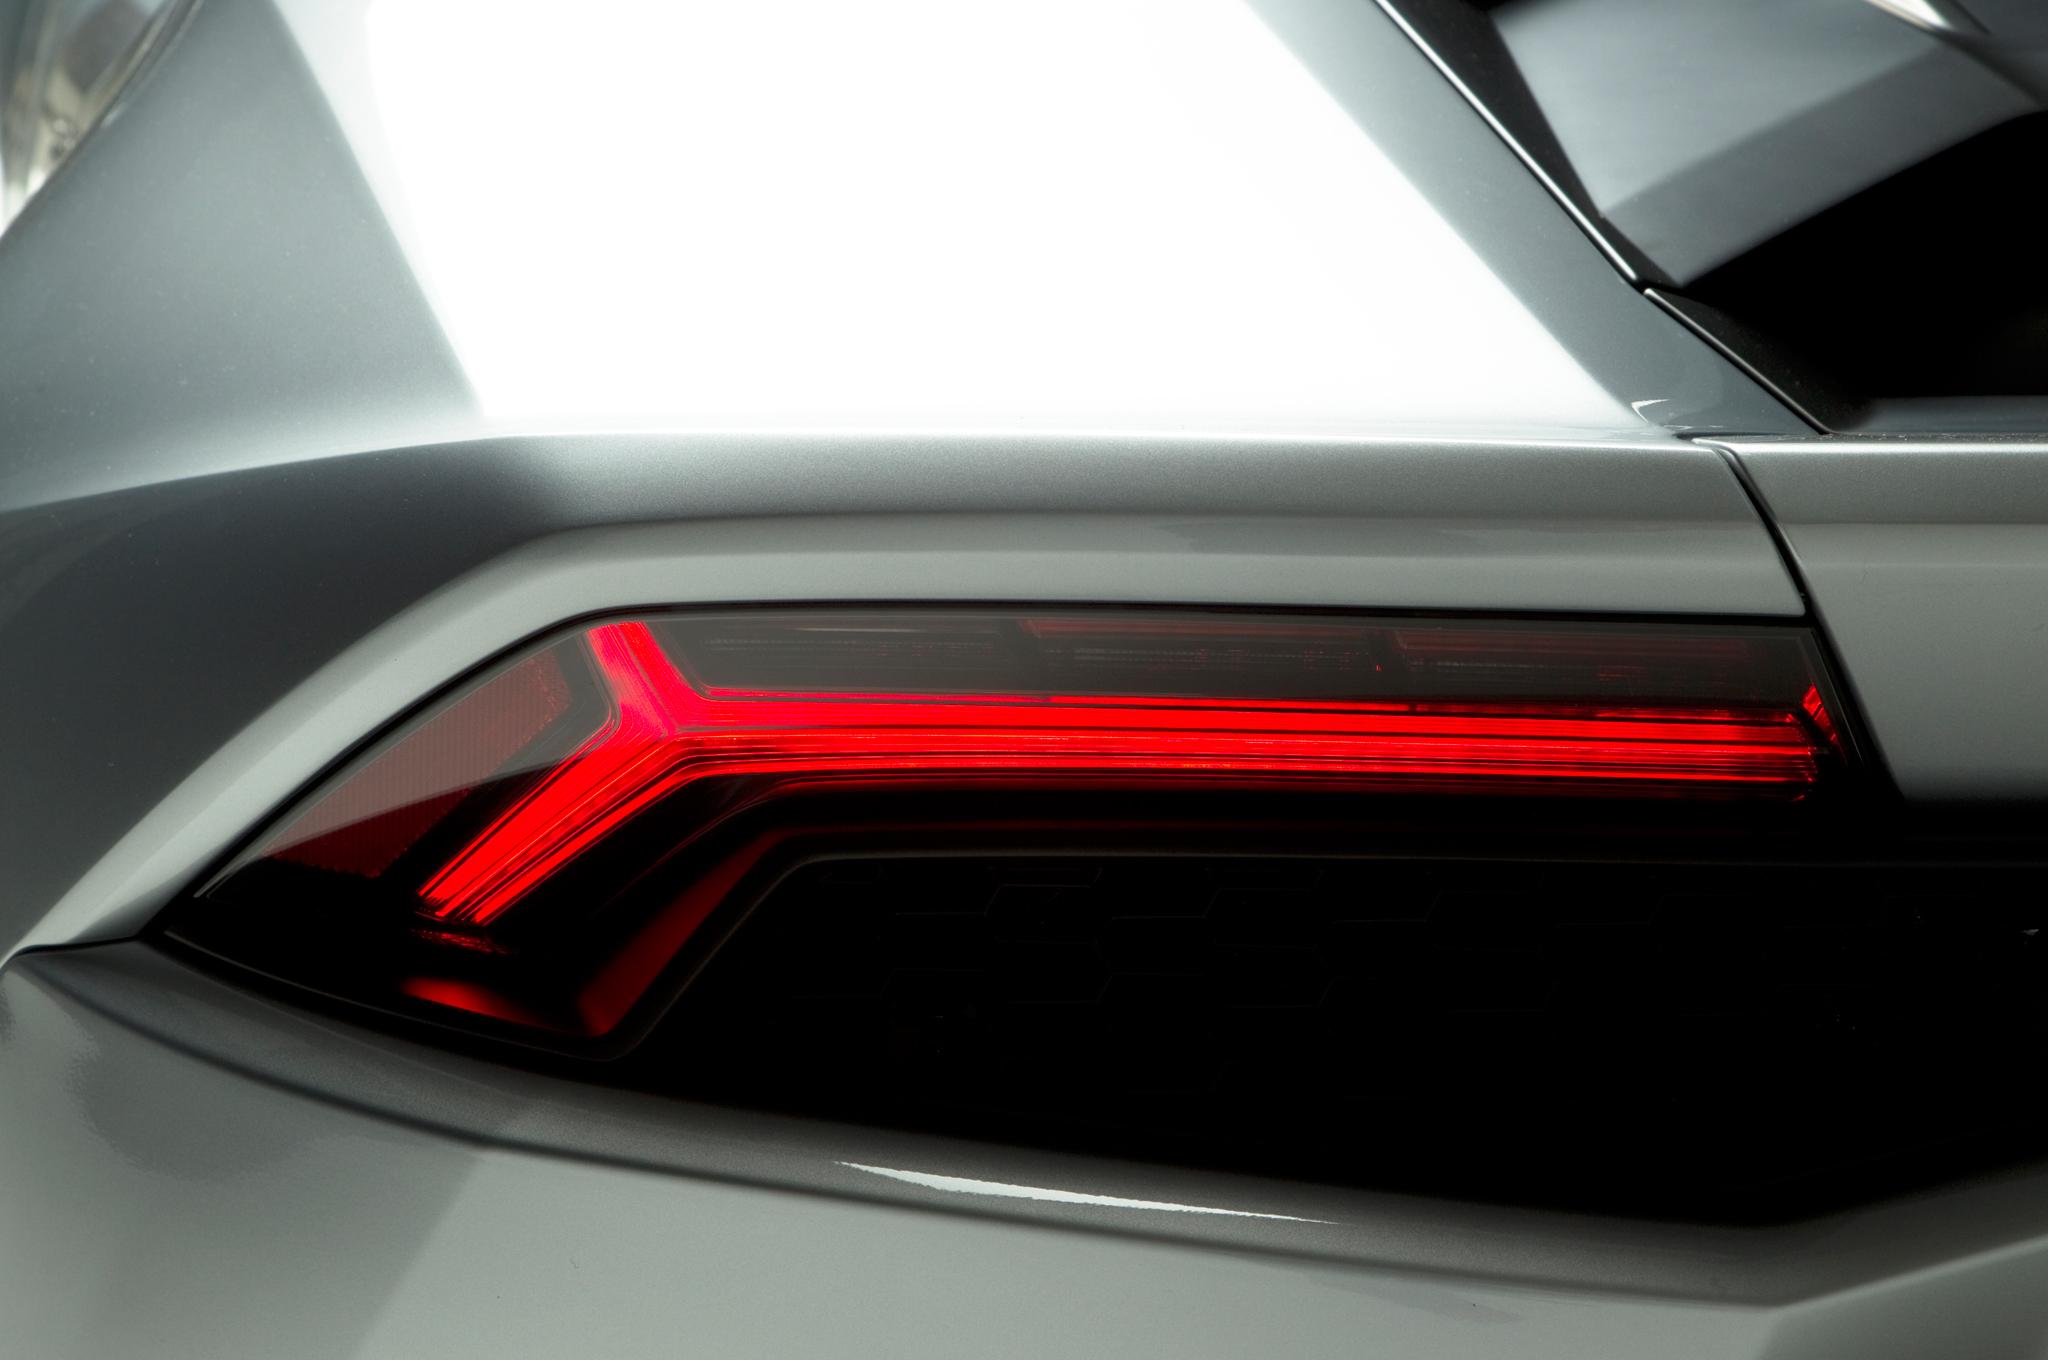 http—image.motortrend.com-f-roadtests-exotic-1312_2015_lamborghini_huracan_first_look-59412248-2015-Lamborghini-Huracan-taillight